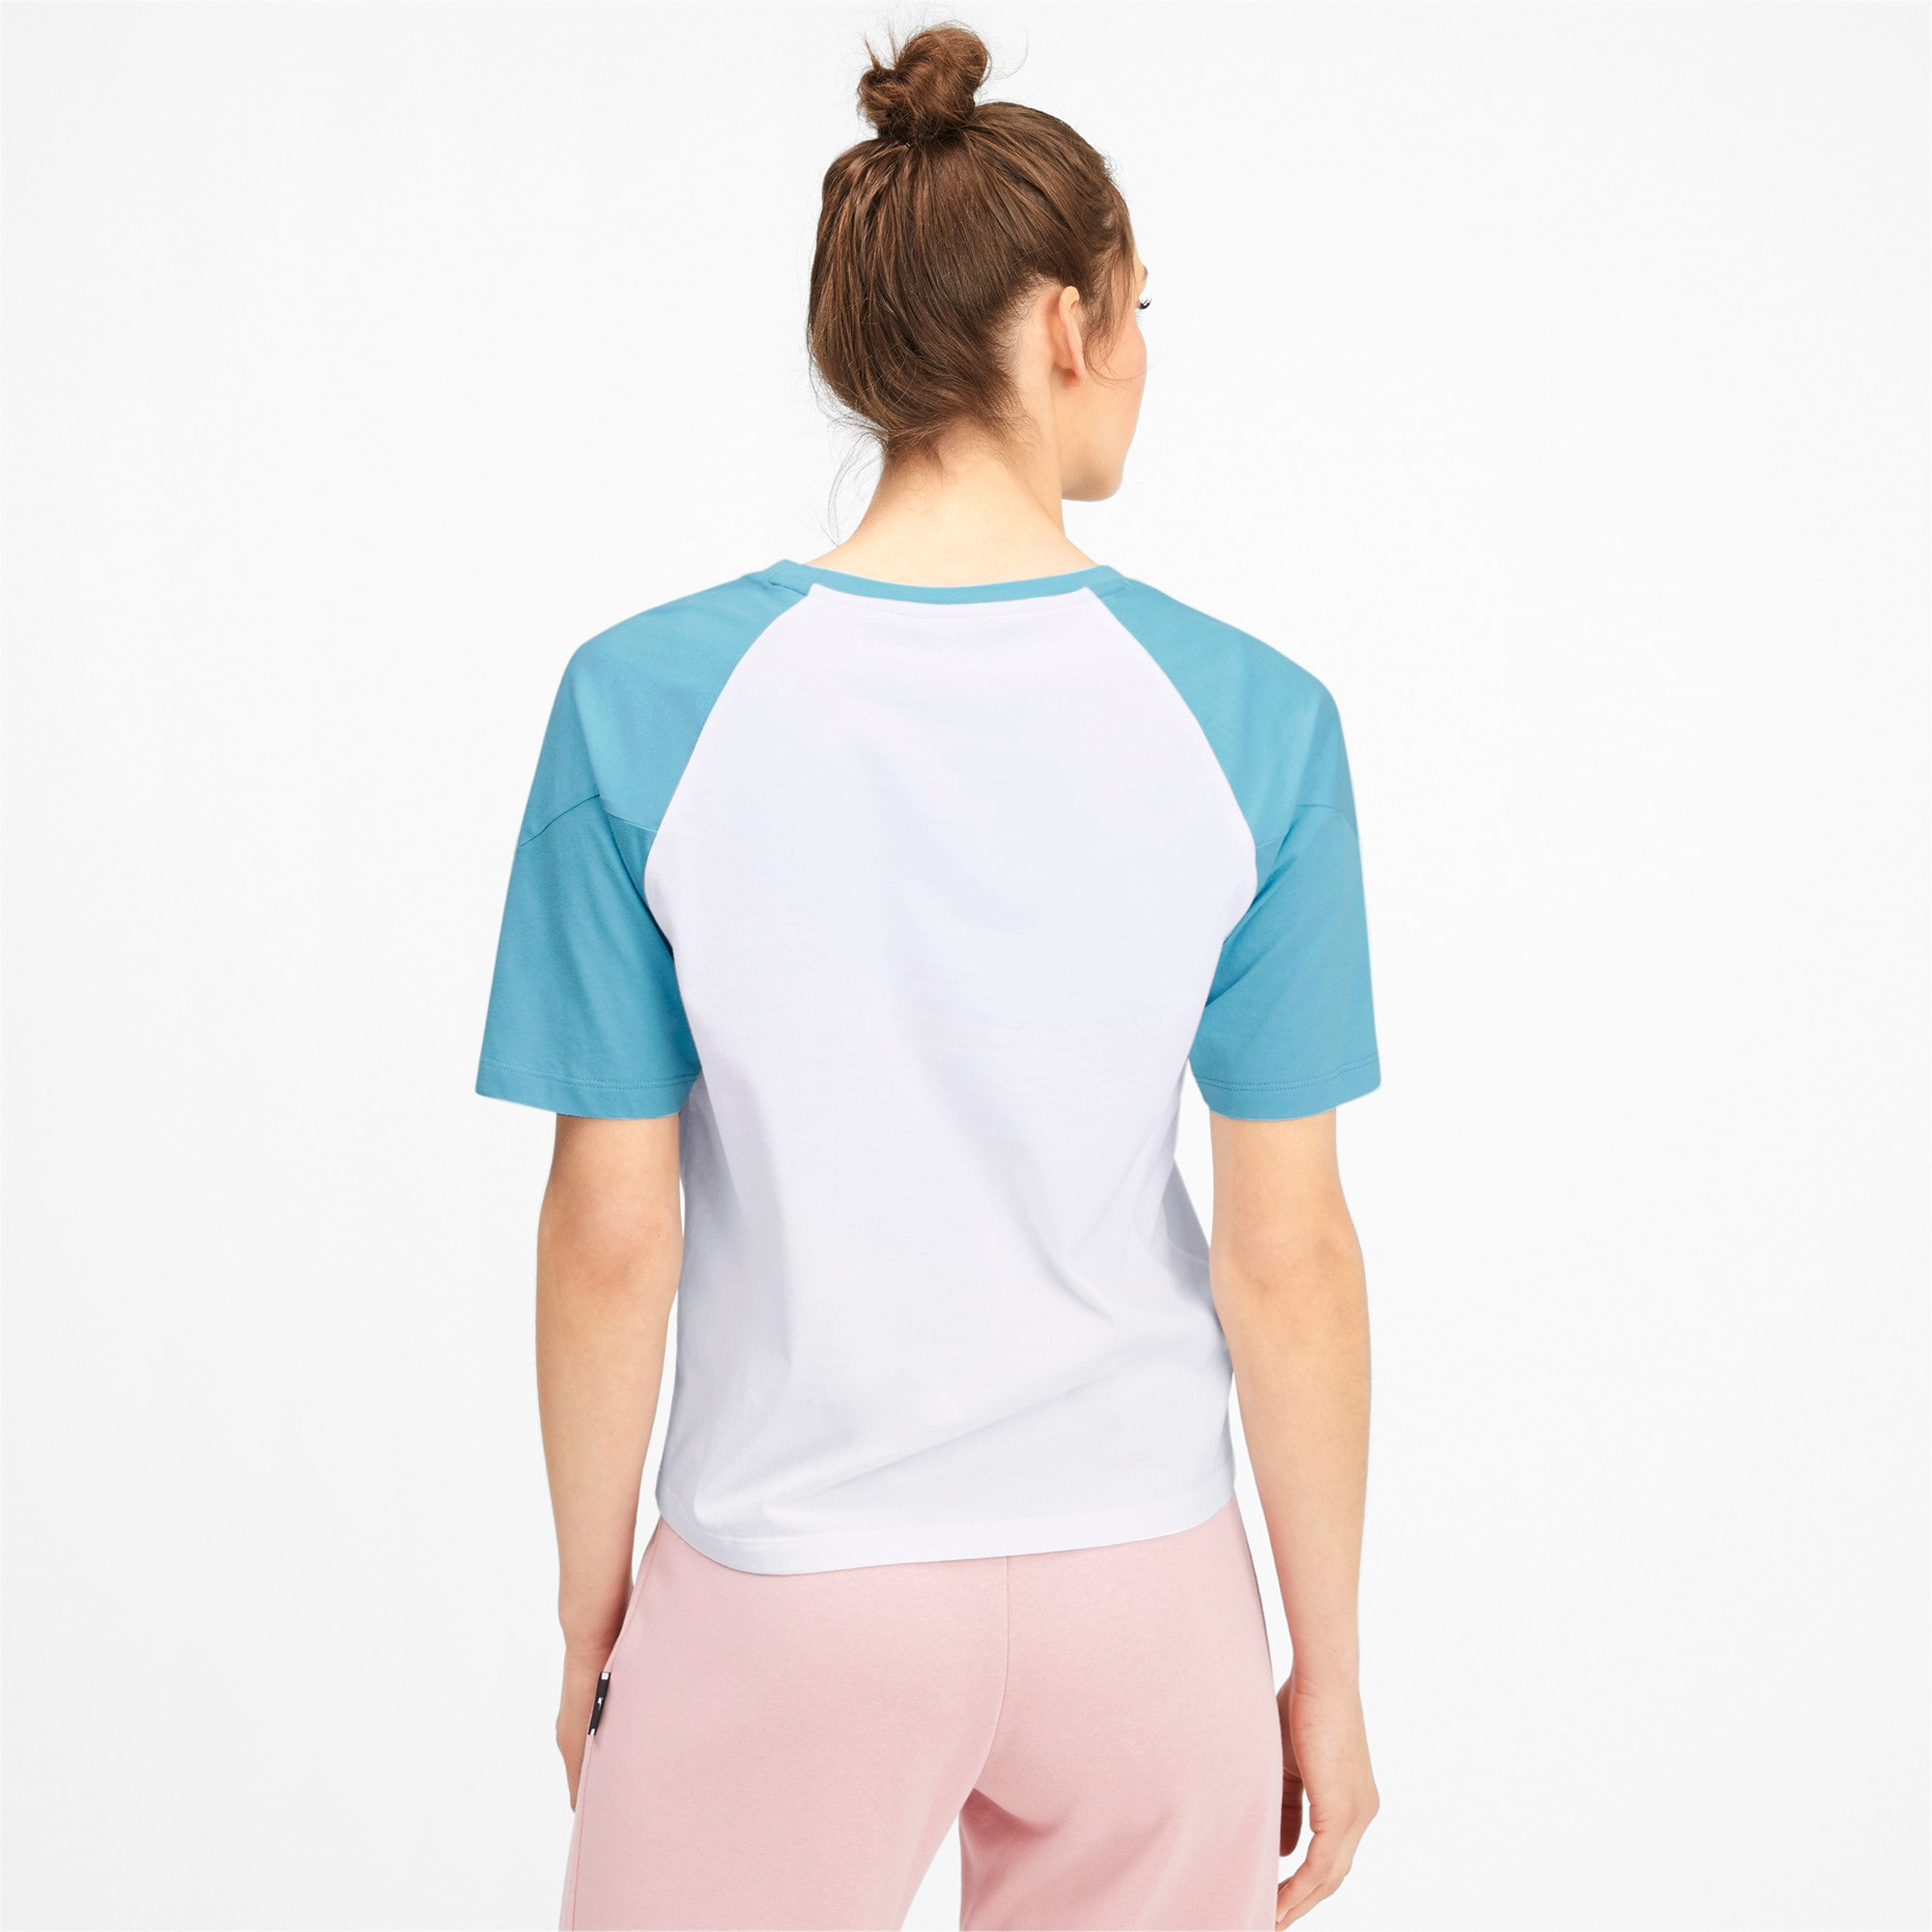 Miniatura 2 de Camiseta PUMA XTG en colores combinados para mujer, Puma White, mediano